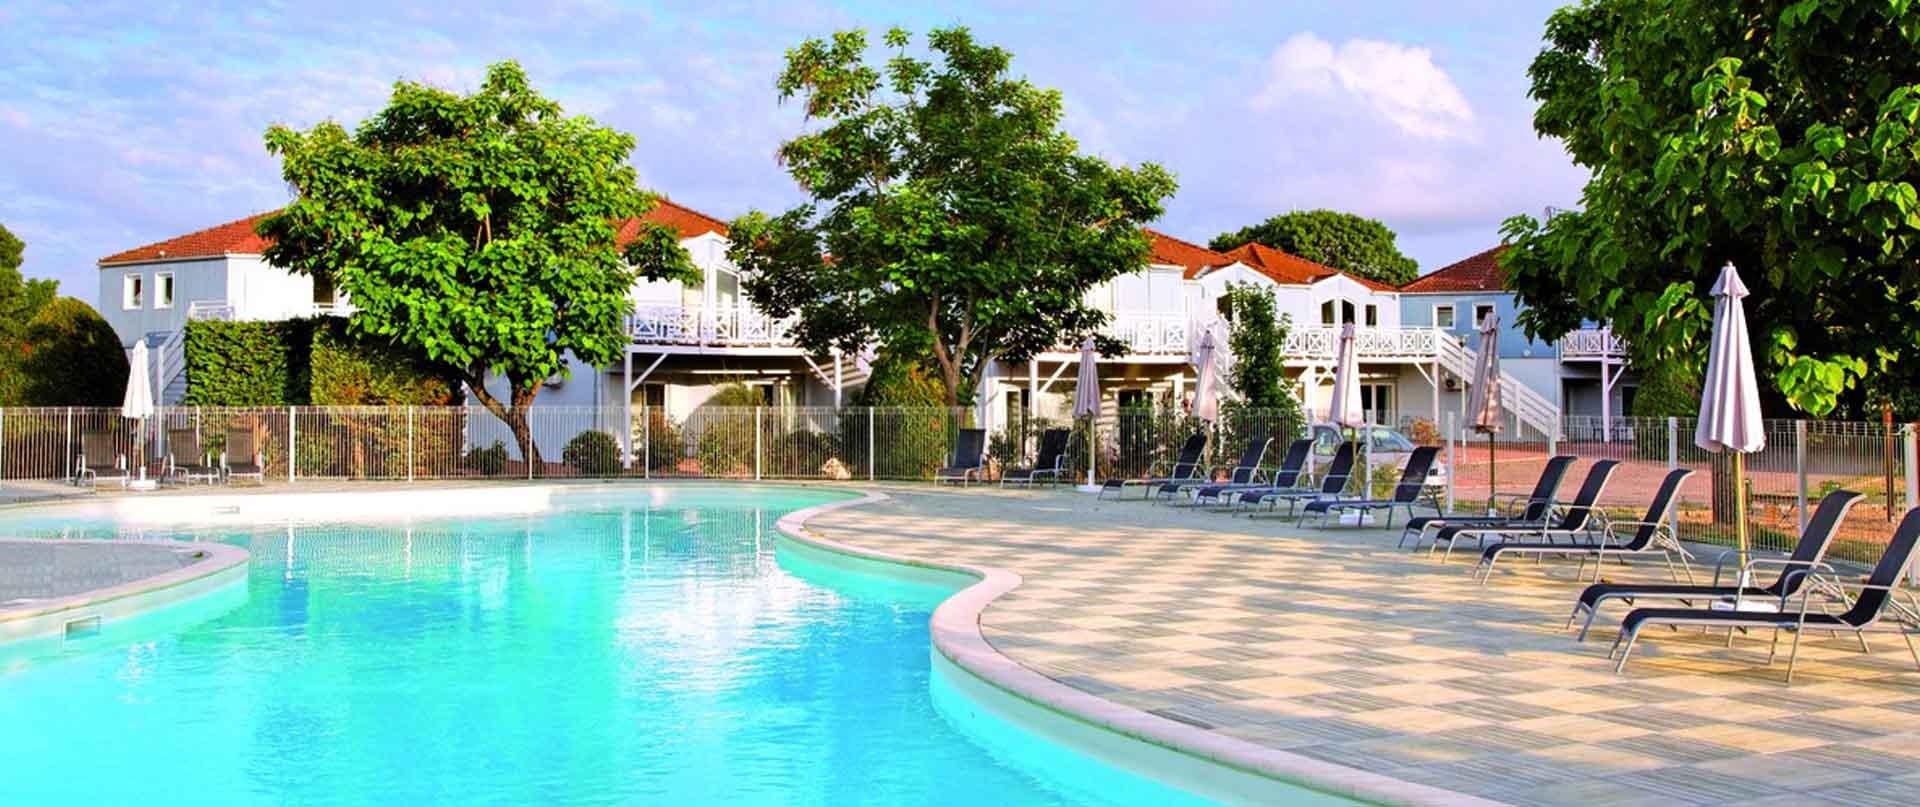 Resort marans la rochelle neh group for Piscine de la rochelle